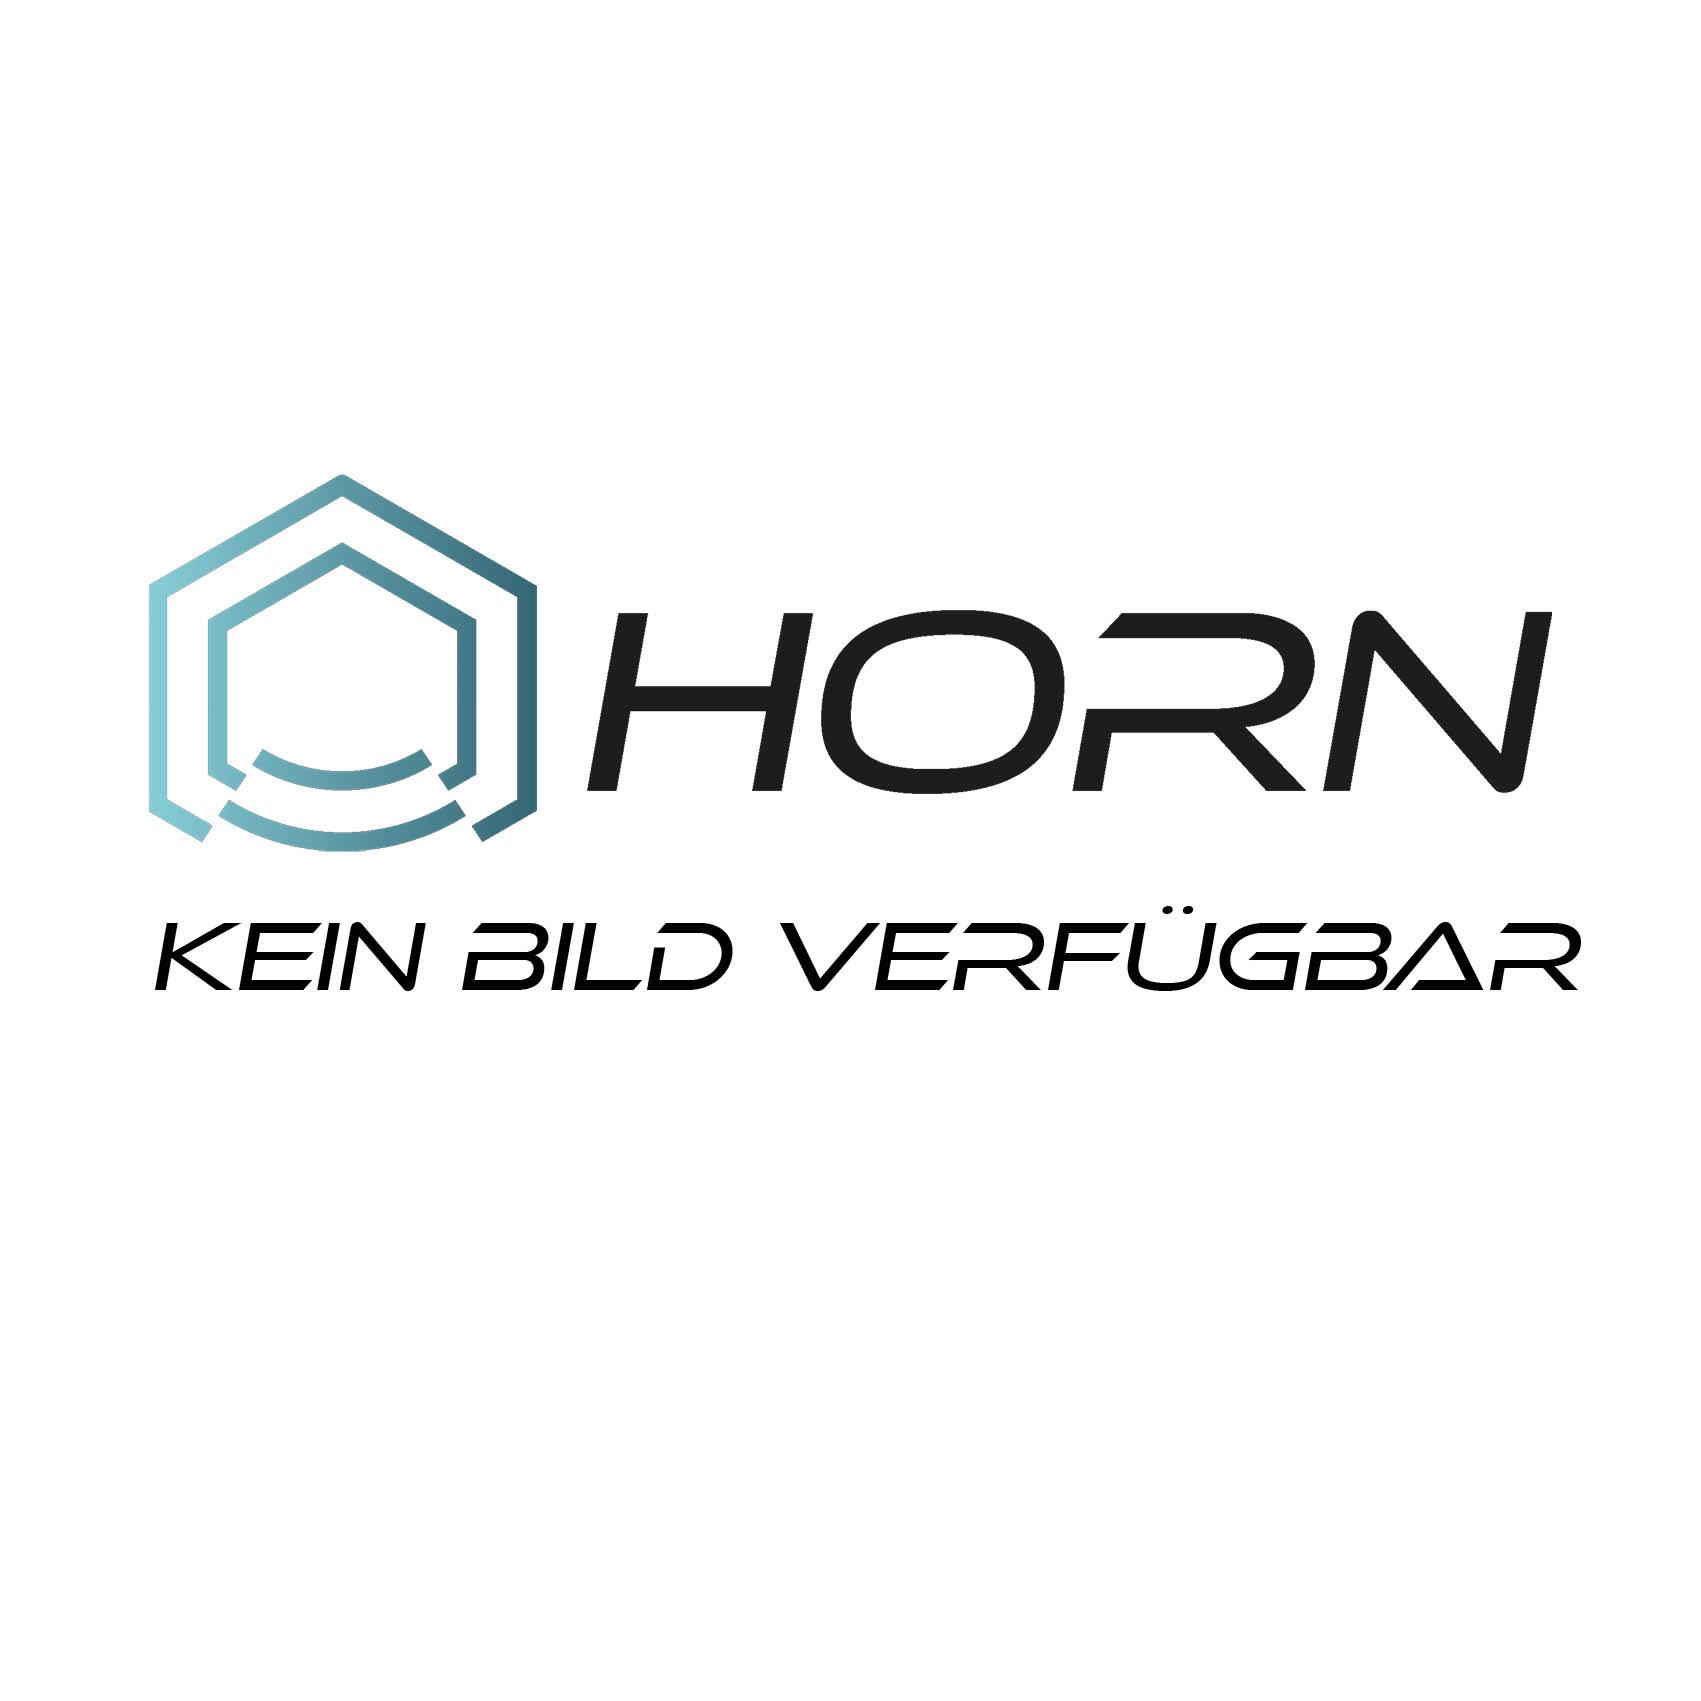 horn online scharnier k ntig 80x80 mm edelstahl 5320235 vormann scharnier. Black Bedroom Furniture Sets. Home Design Ideas